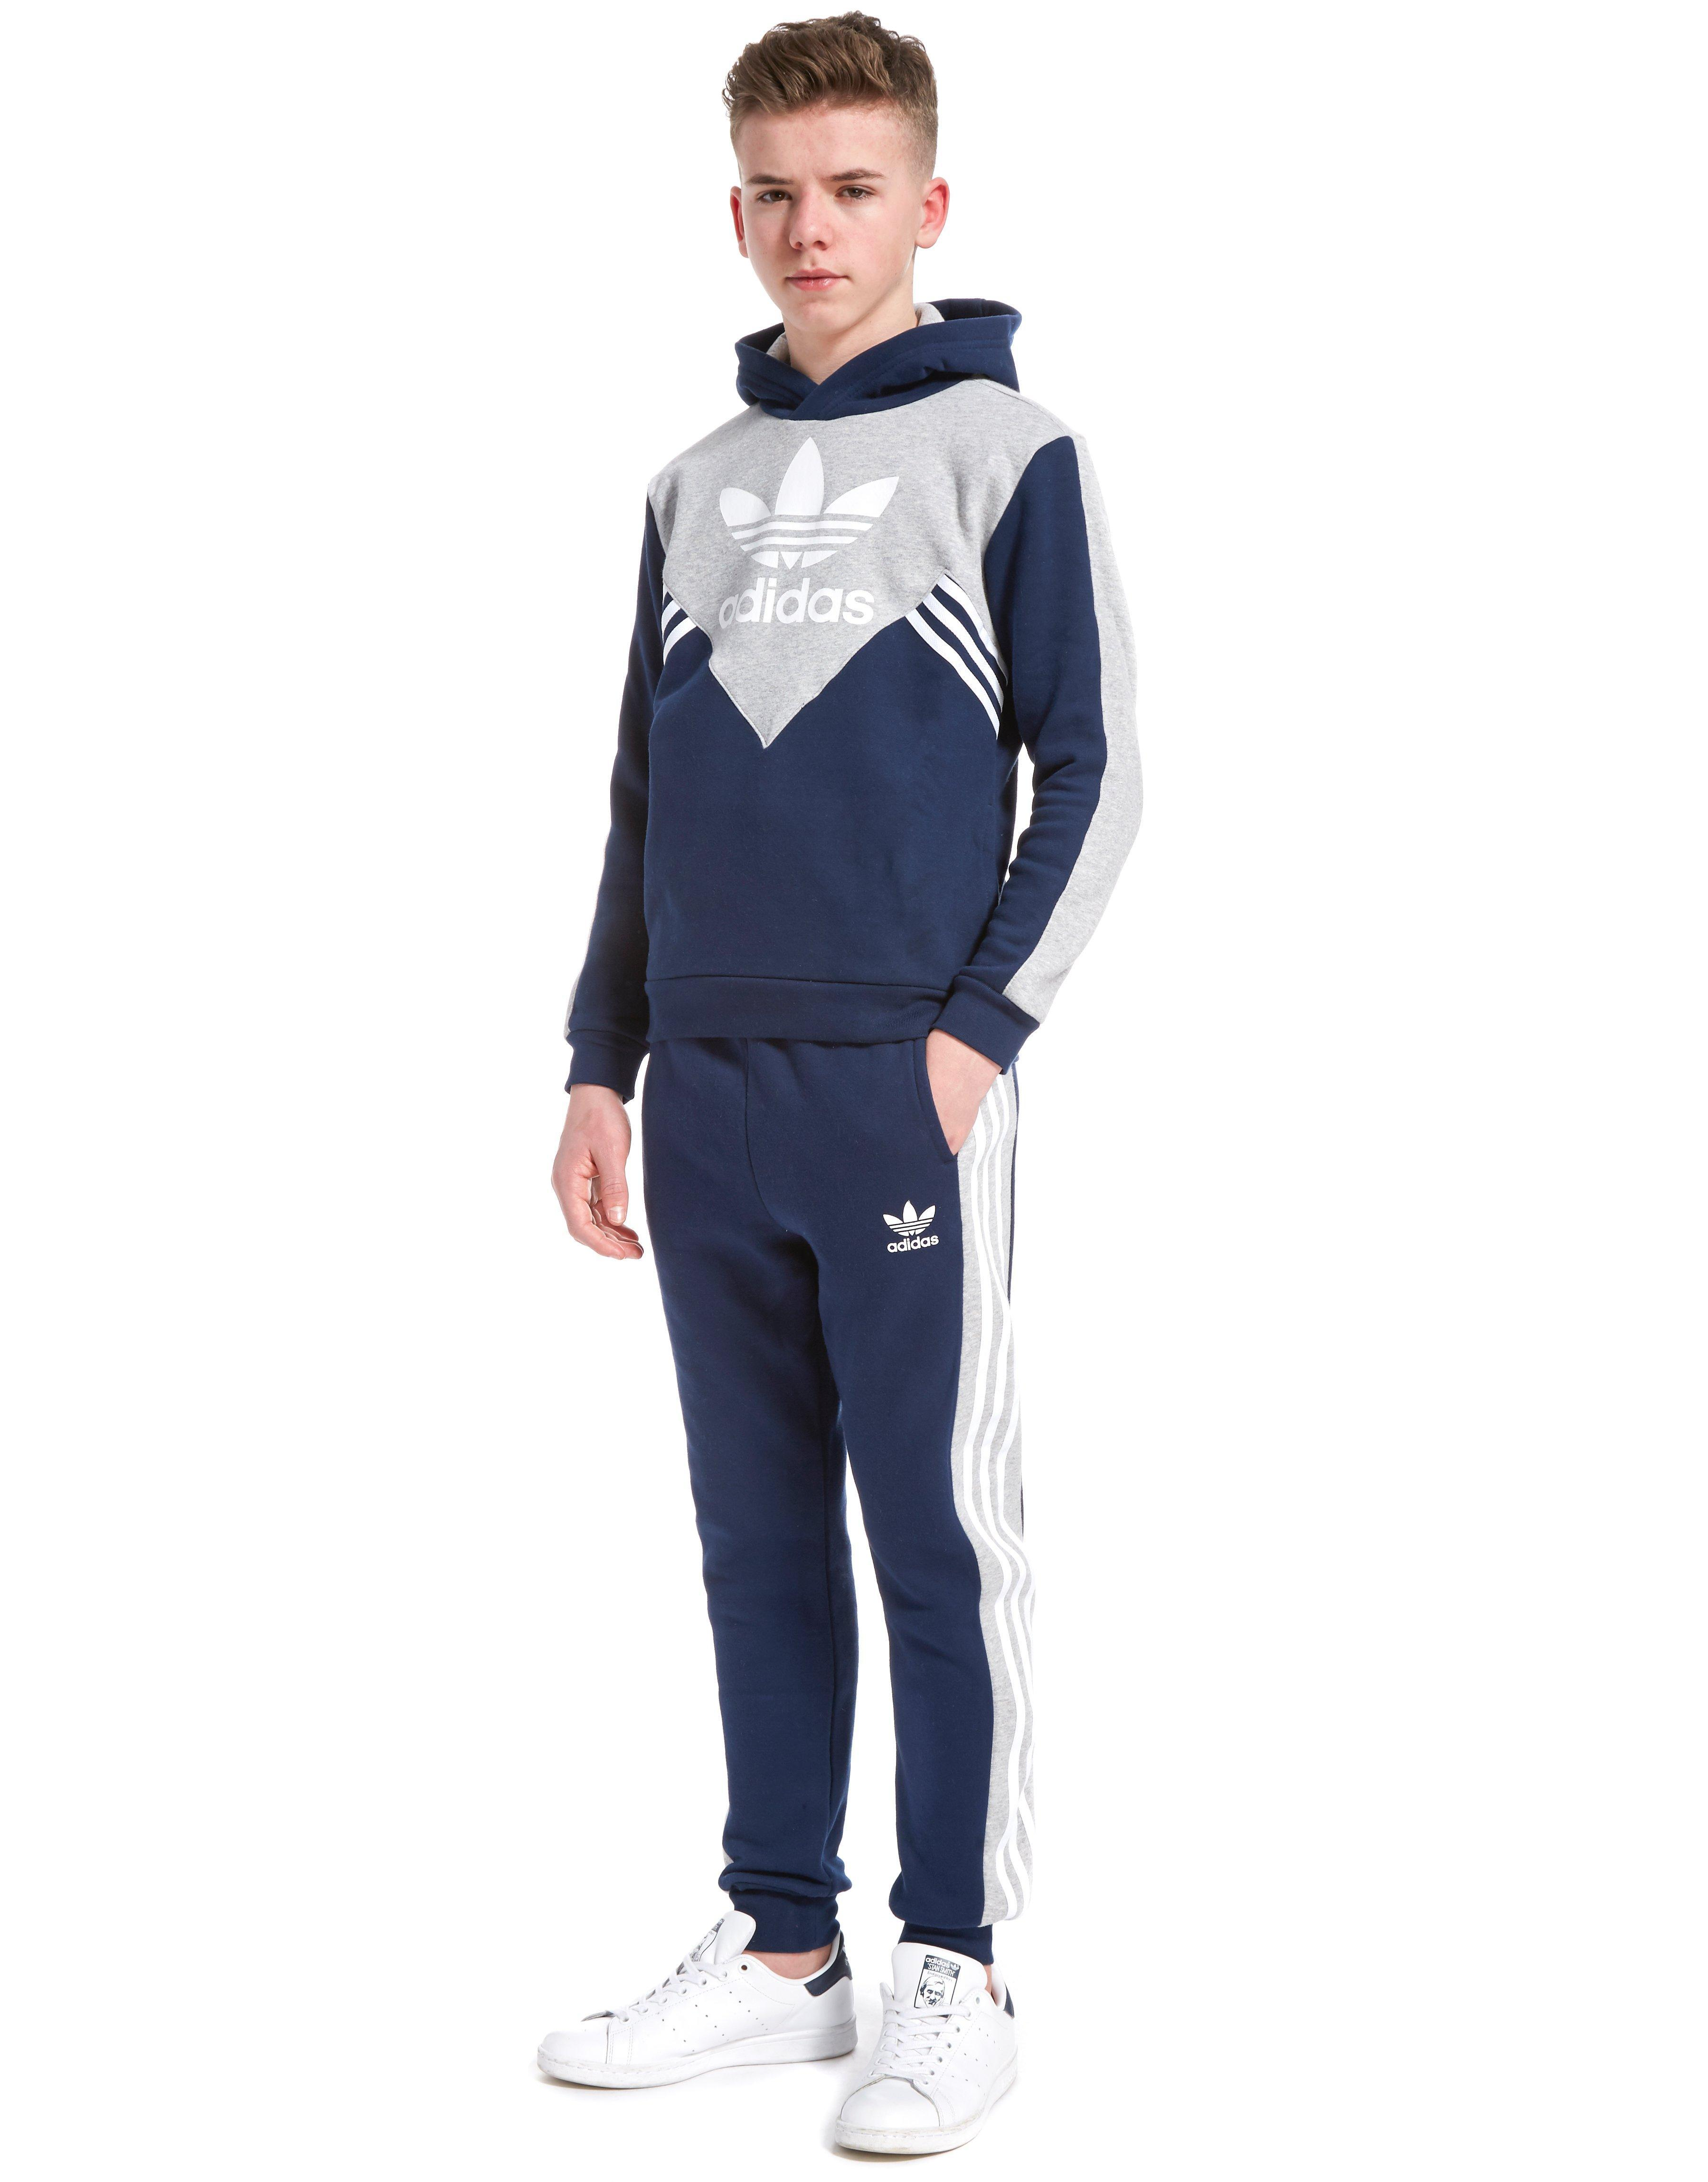 adidas fleece navy